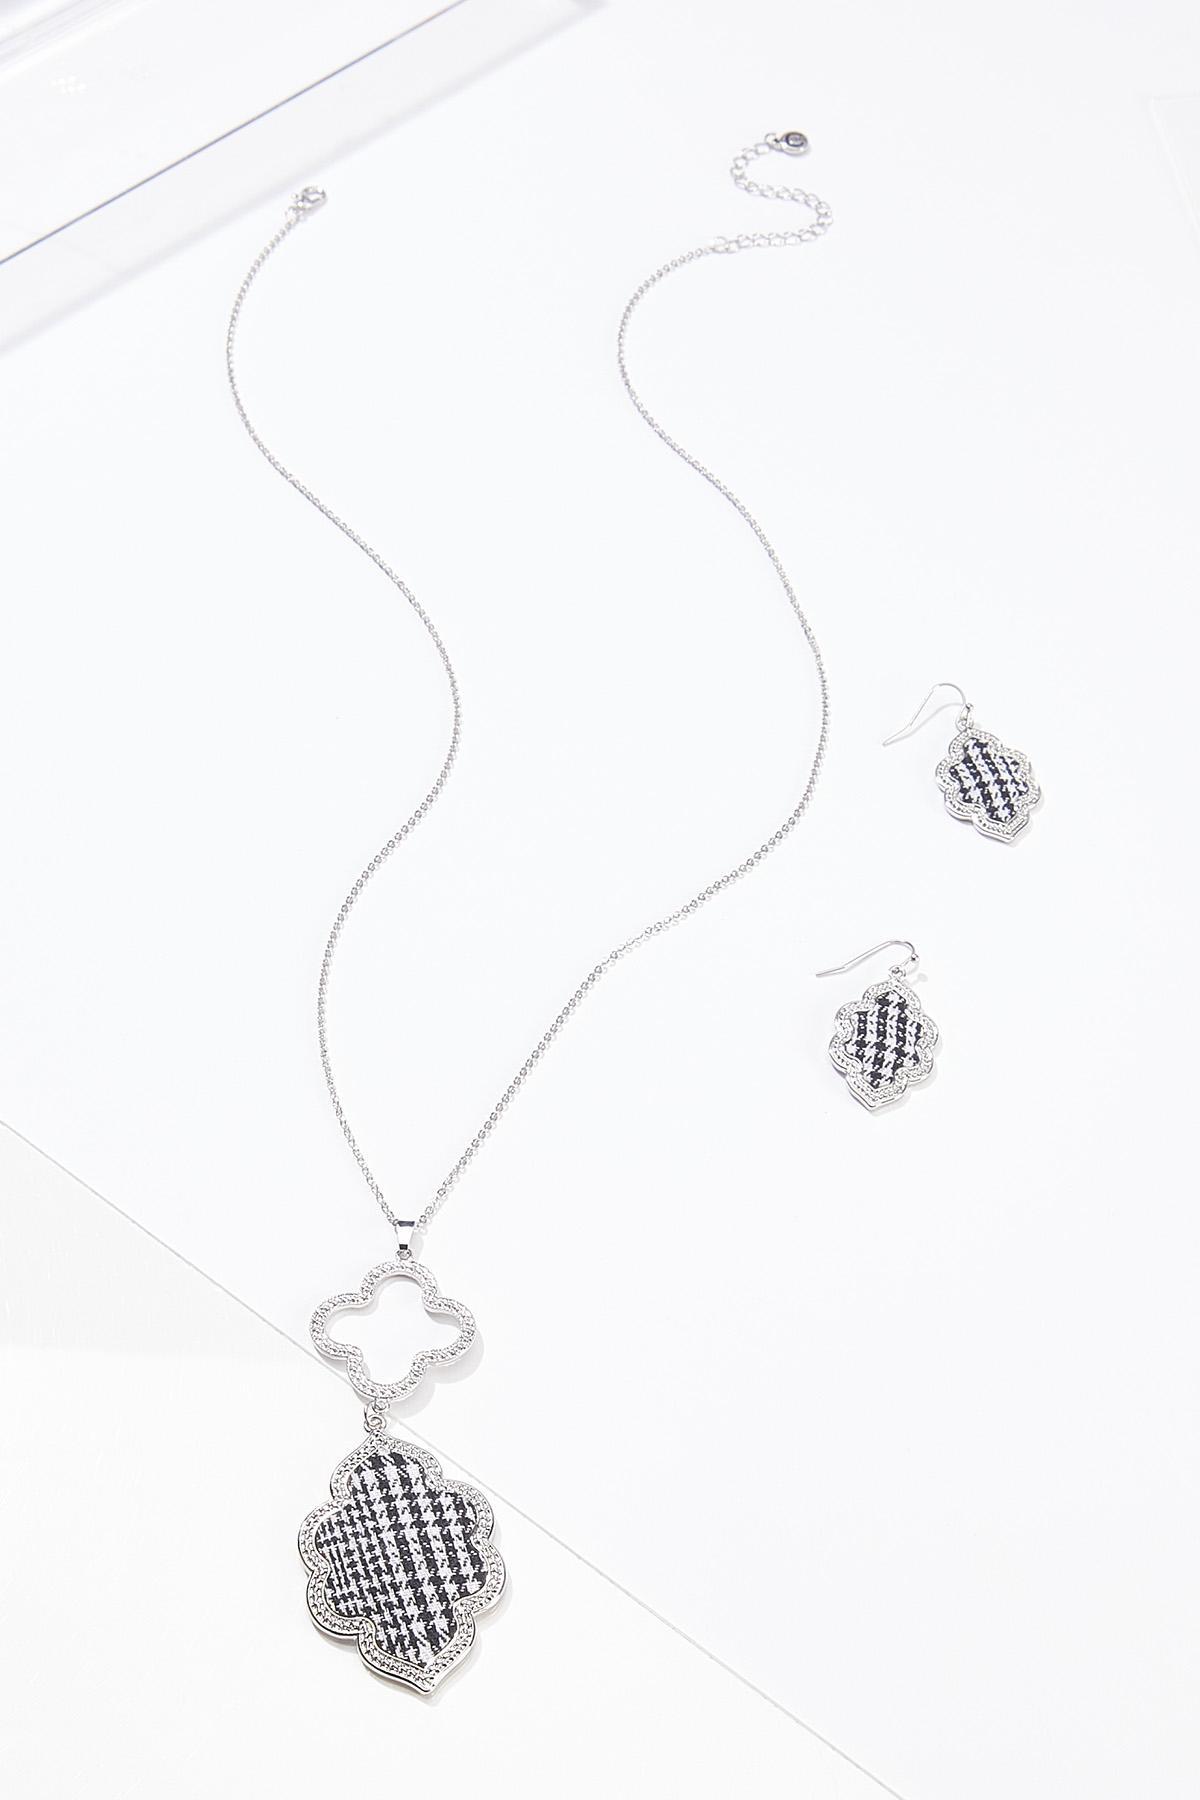 Houndstooth Clover Necklace Earring Set